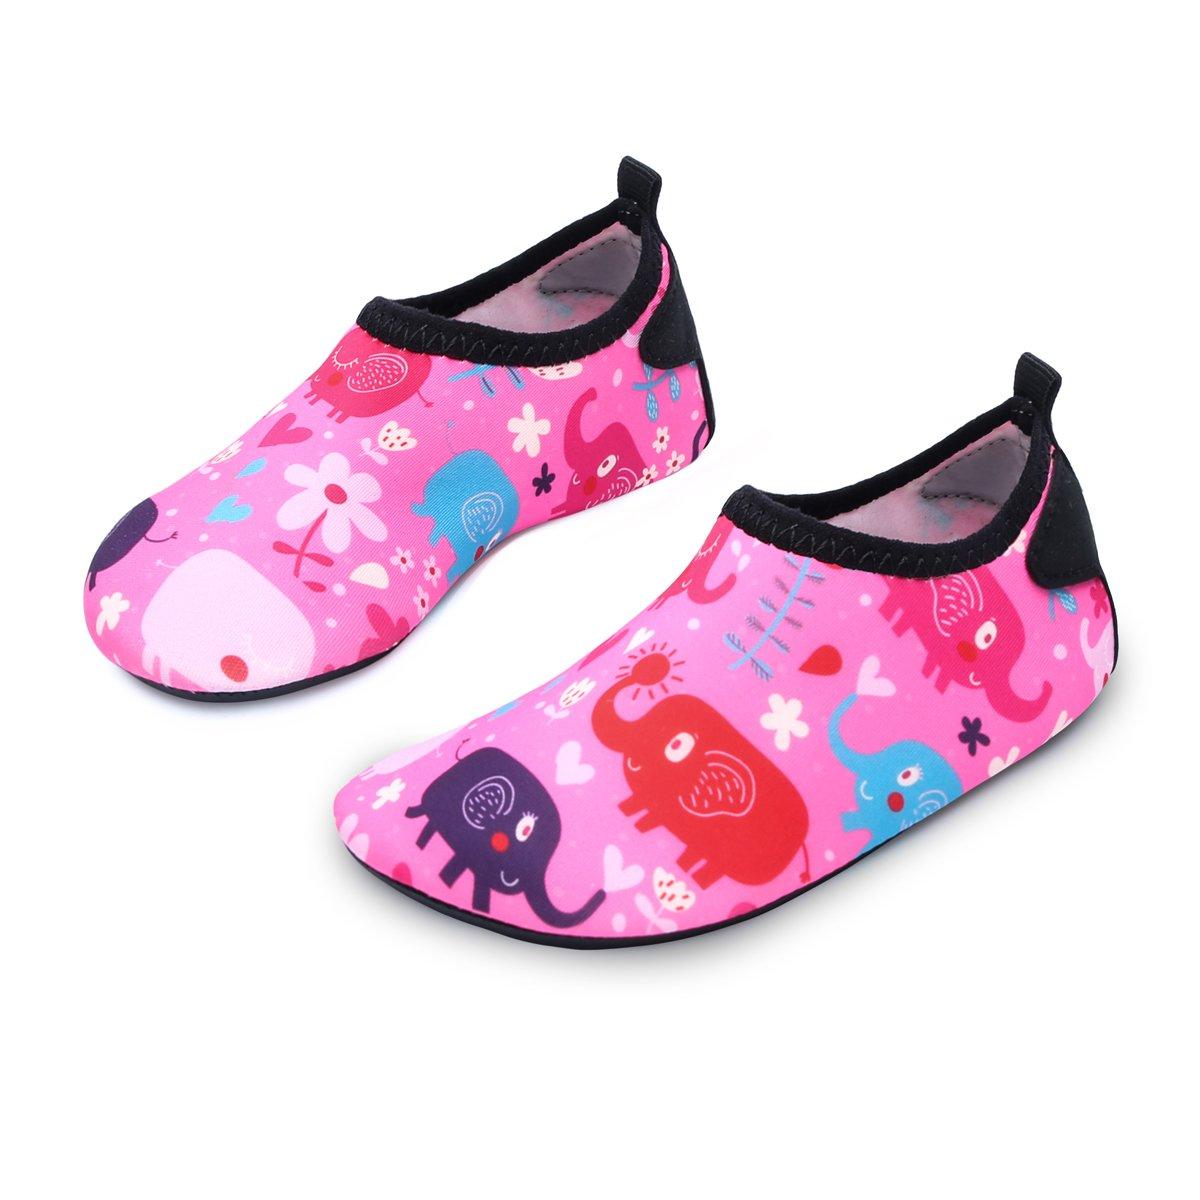 L-RUN Kids Water Shoes Summer Swim Shoes Outdoor Sneaker Pink_red 9.5-10=EU26-27